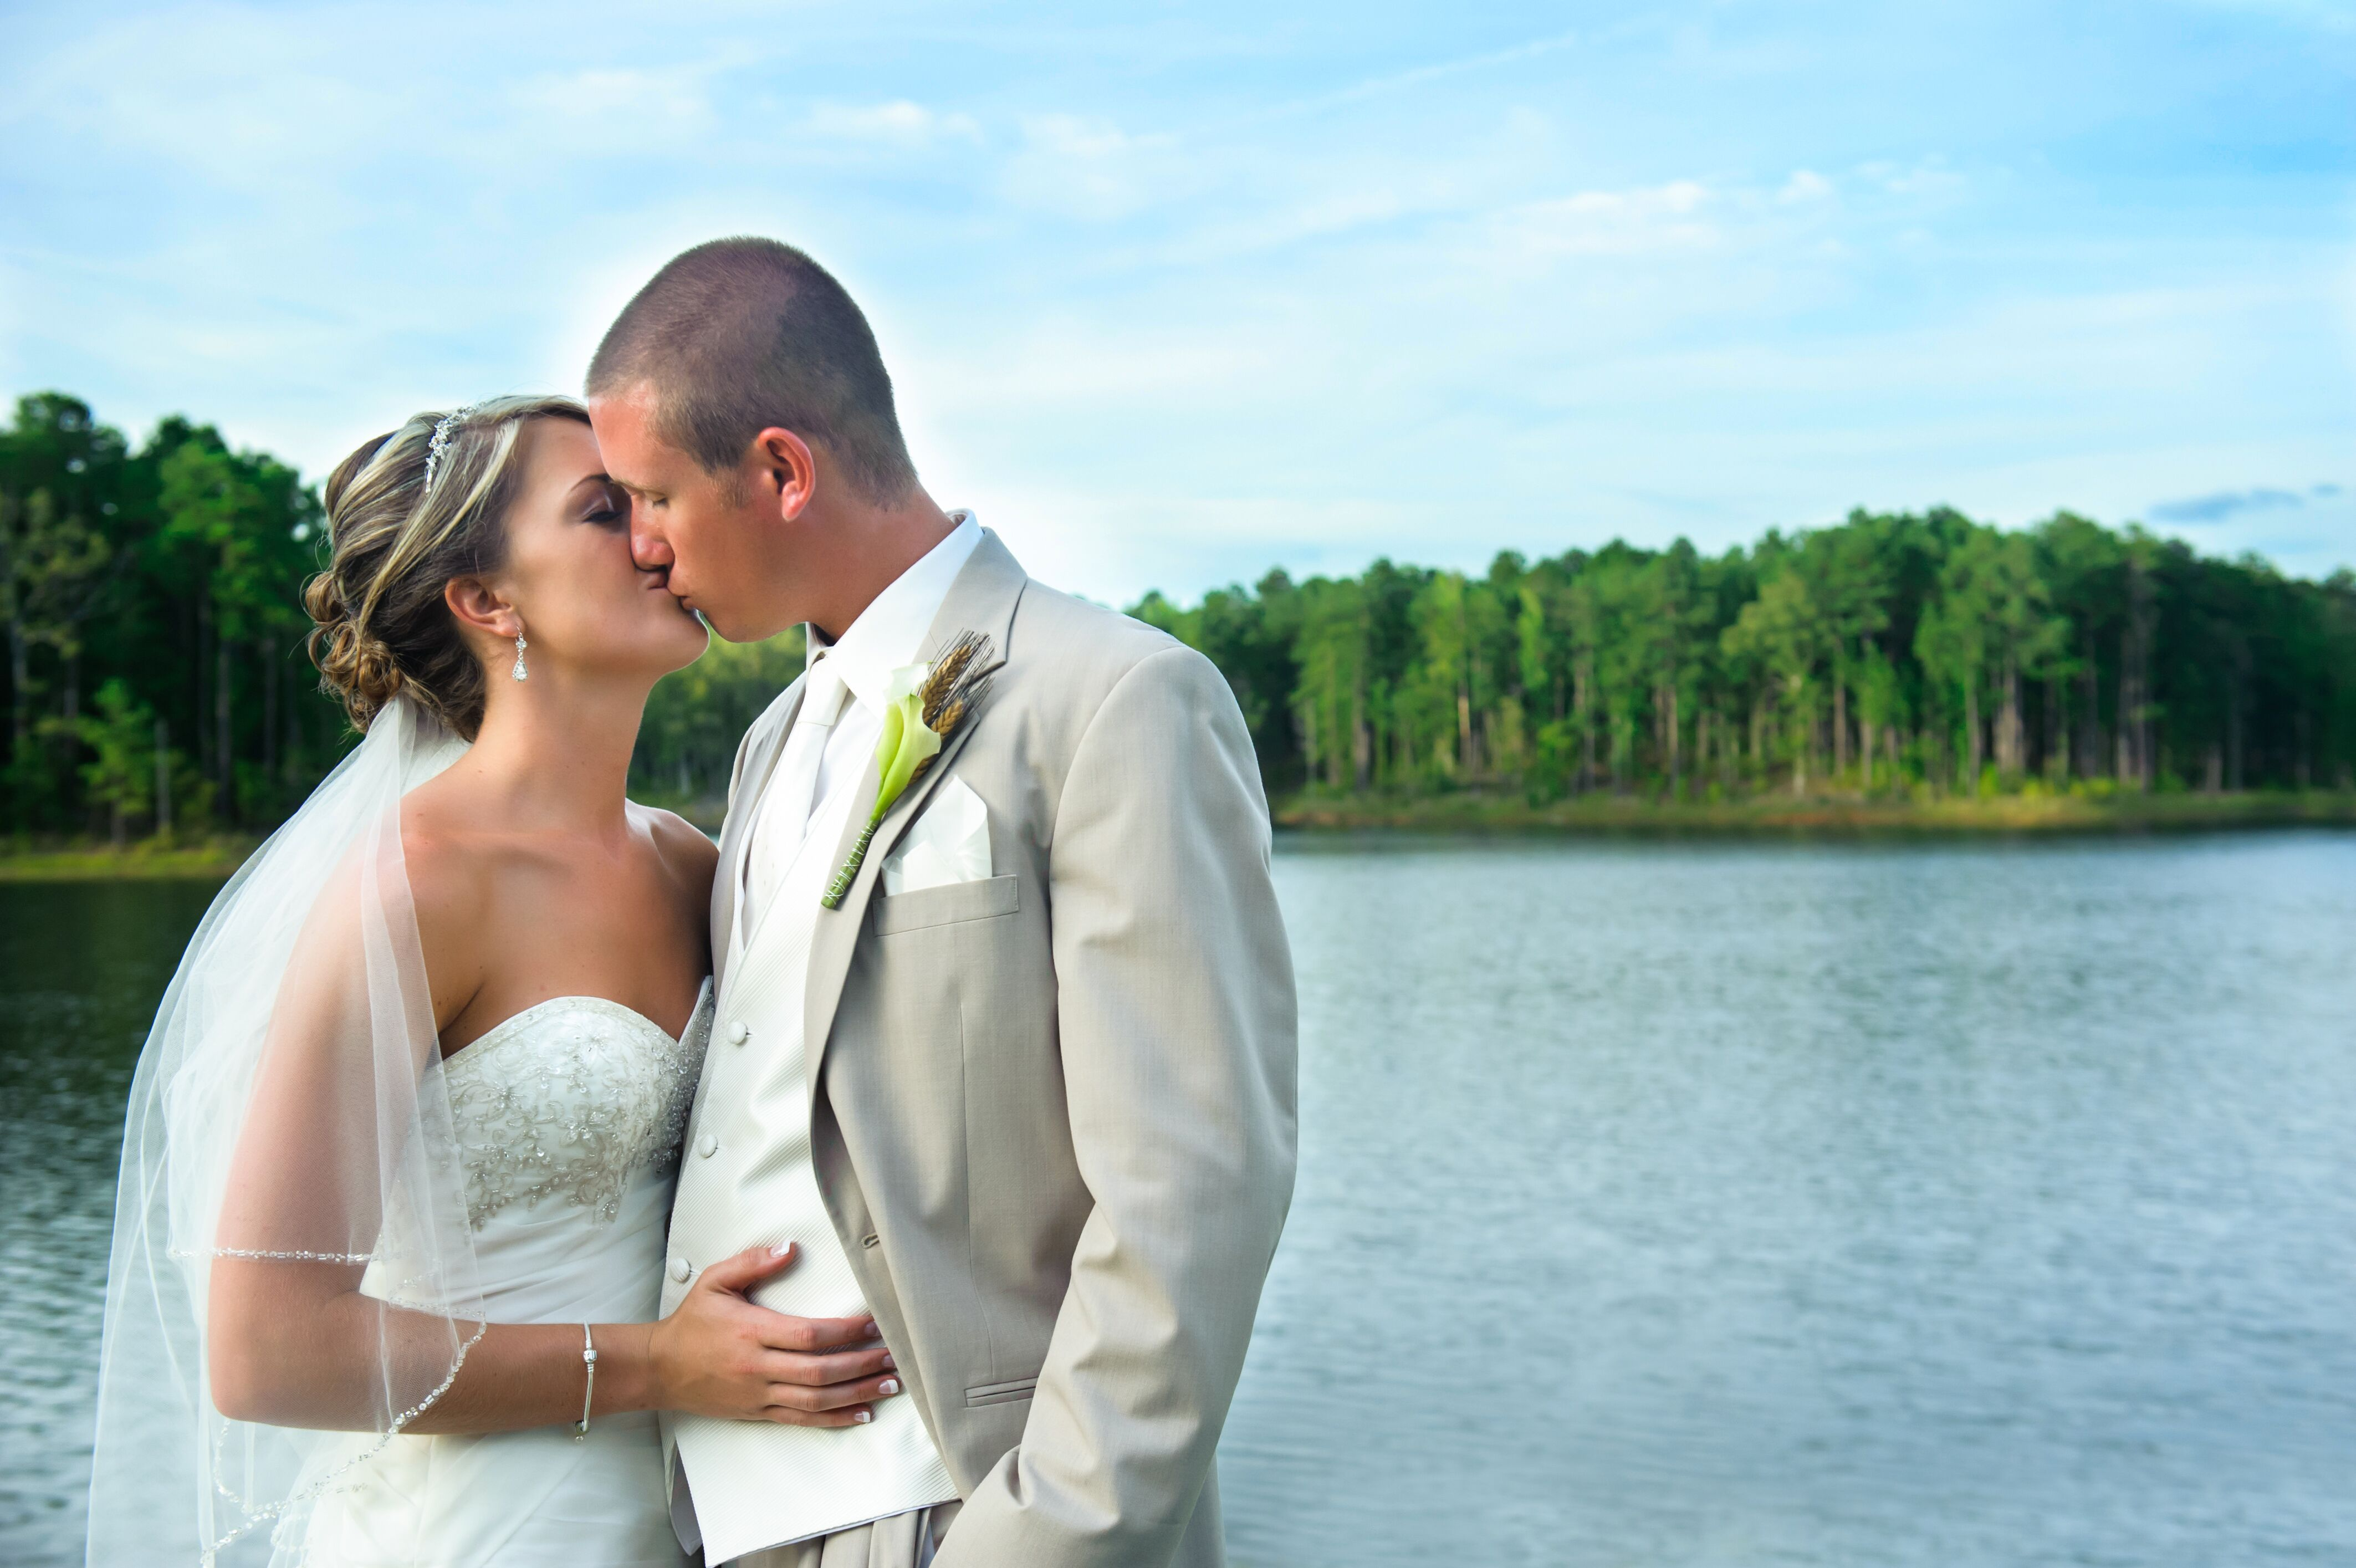 Colorful Wedding Dress Shops Atlanta Ga Inspiration - All Wedding ...